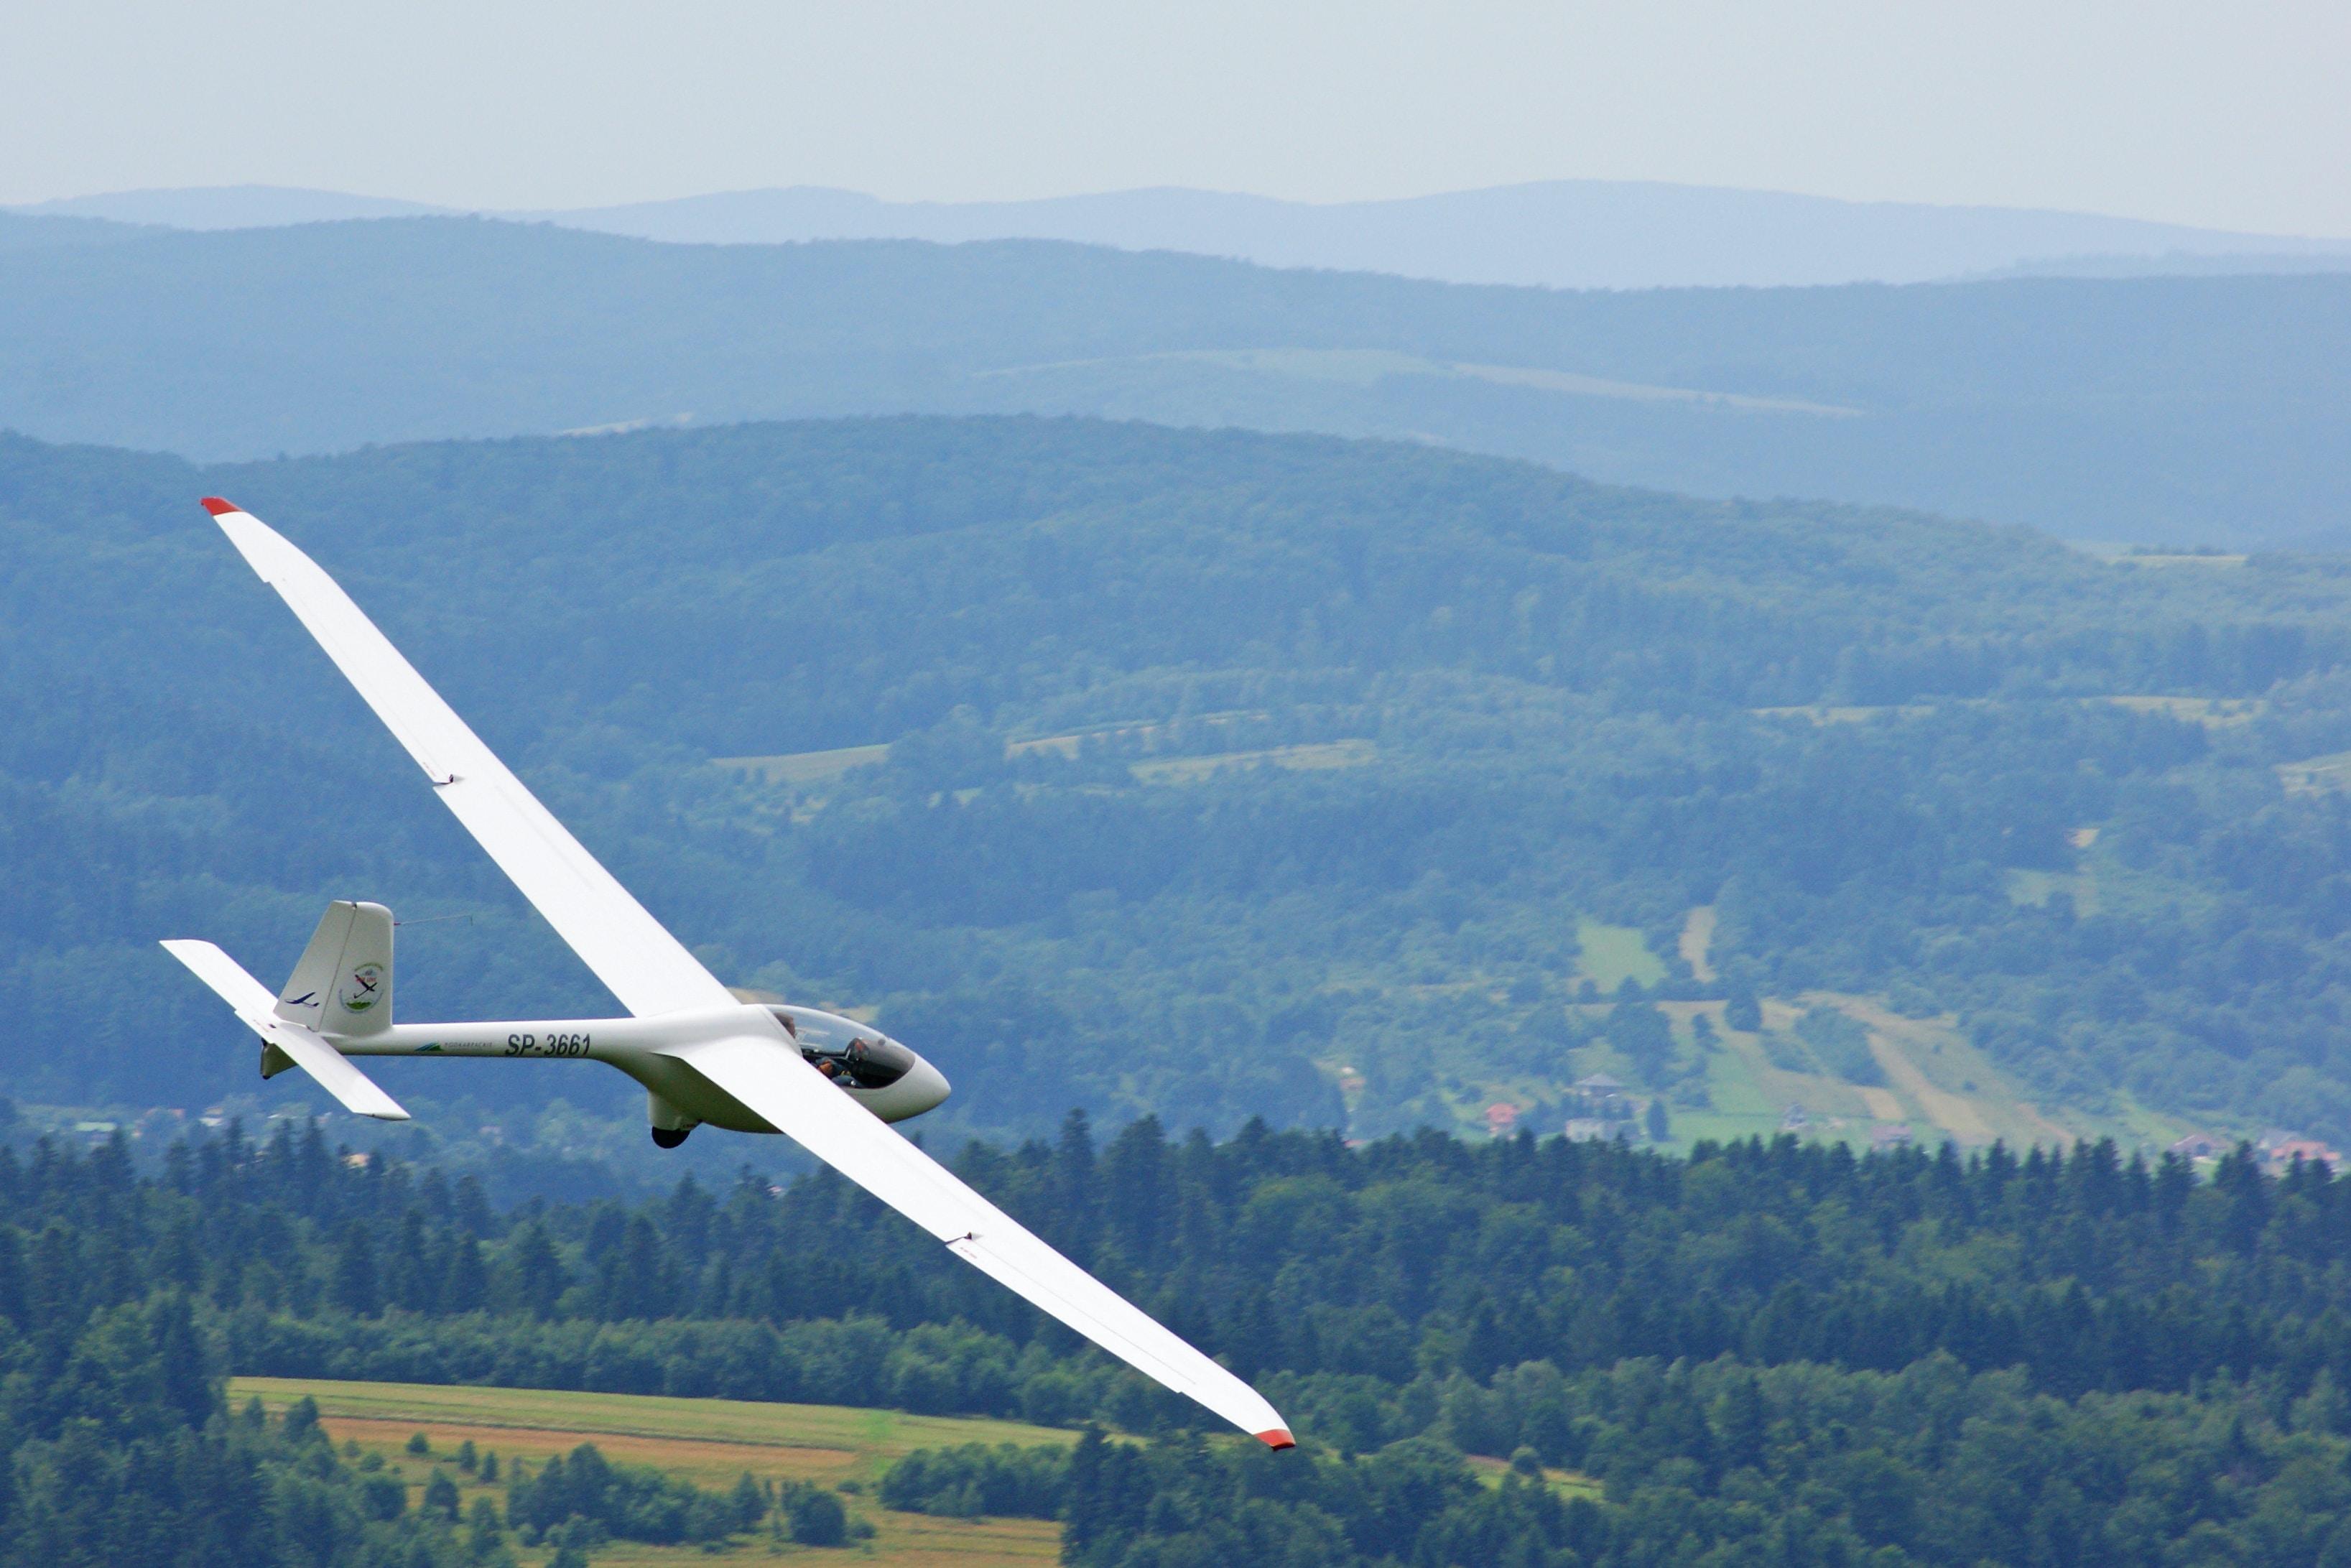 white plane flying mid-air during daytime